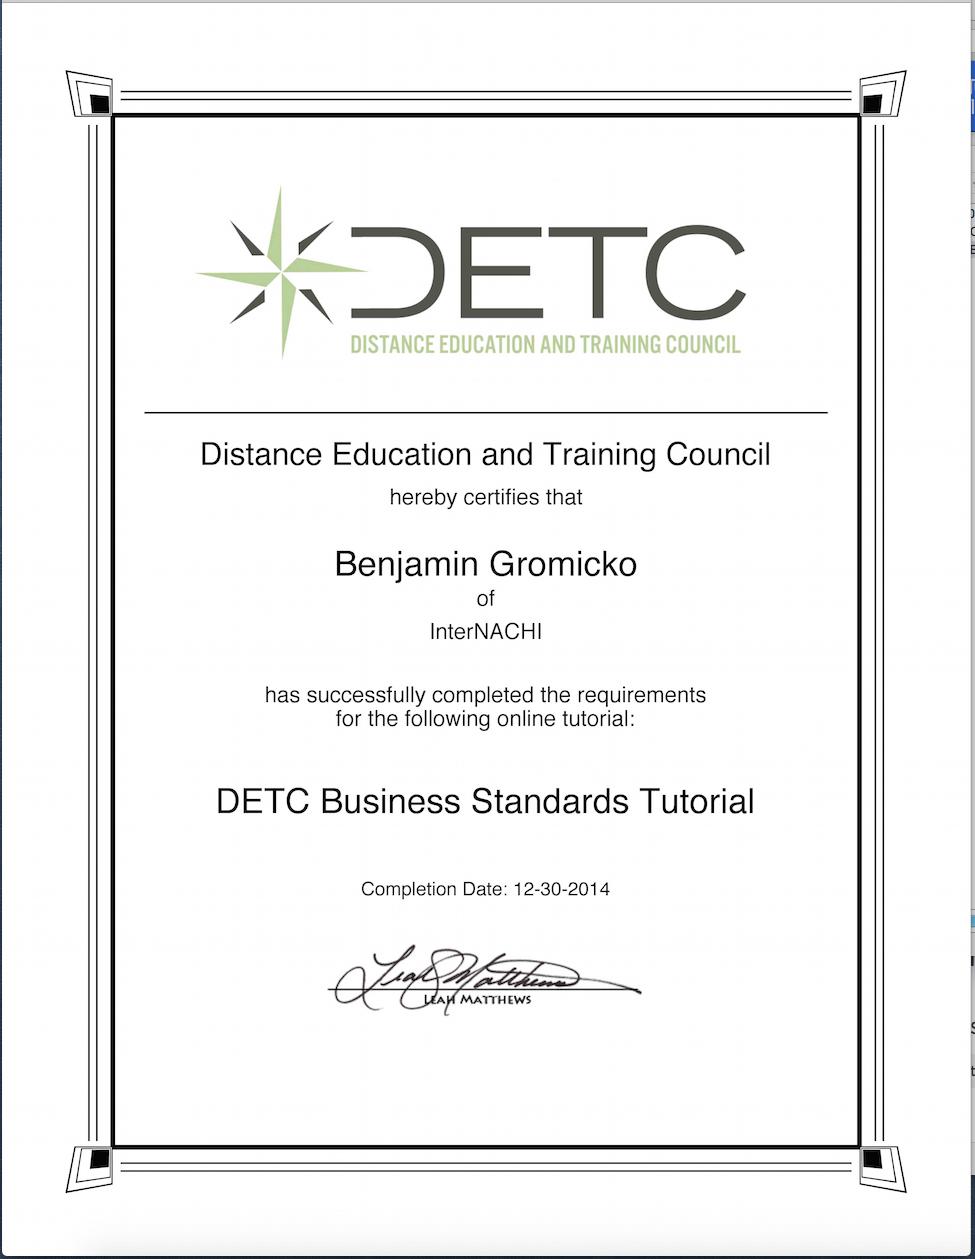 Ben gromicko intl association of certified home inspectors certified distance education instructor xflitez Choice Image